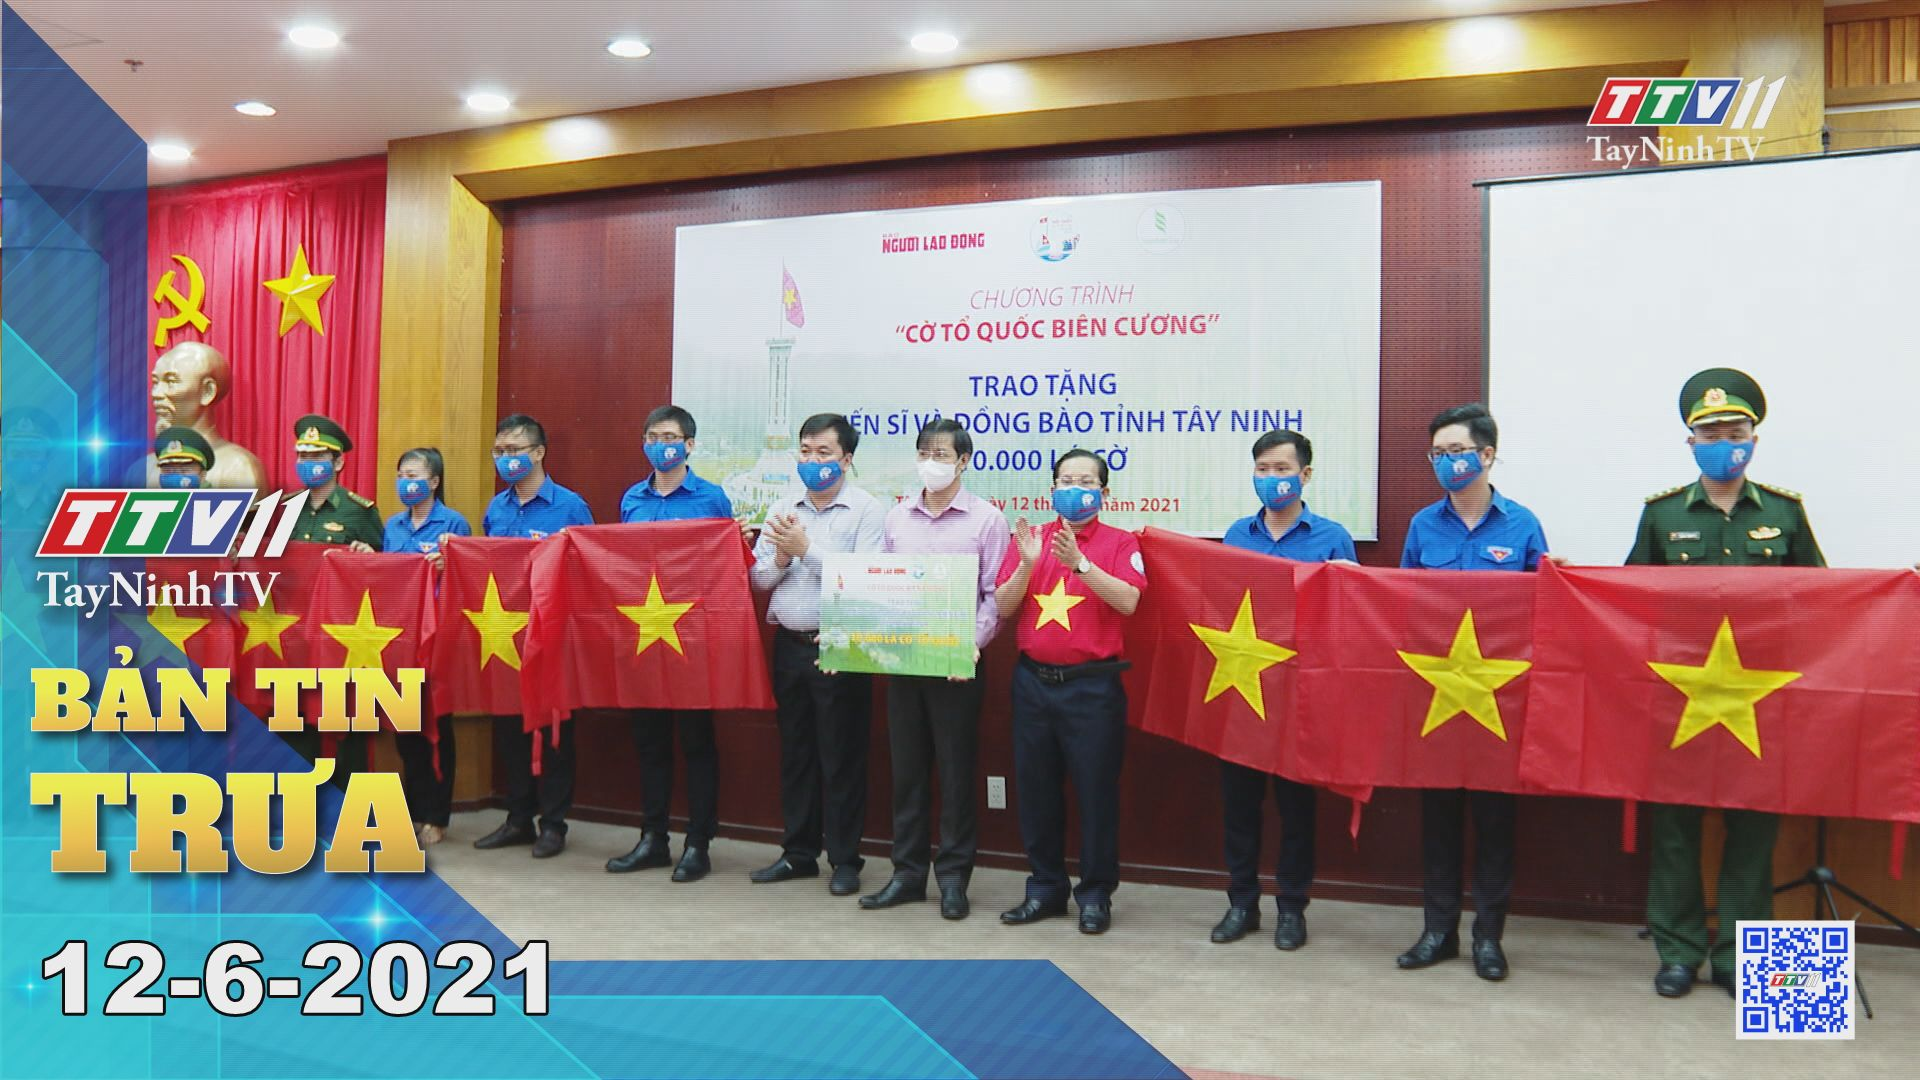 Bản tin trưa 12-6-2021 | Tin tức hôm nay | TayNinhTV